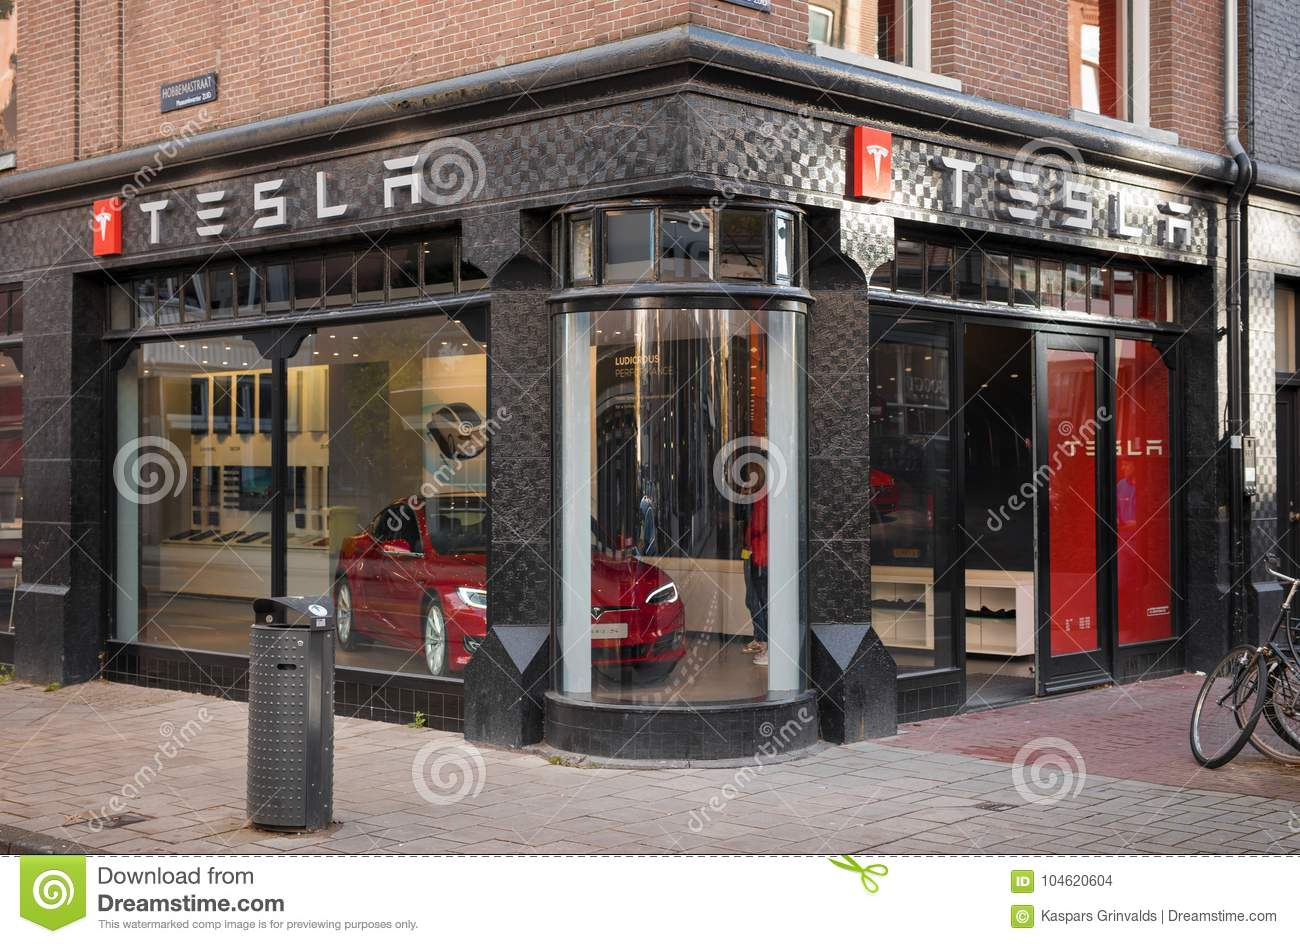 topo_amsterdam-netherlands-november-tesla-motors-storefront-amsterdam-amsterdam-netherlands-tesla-mo